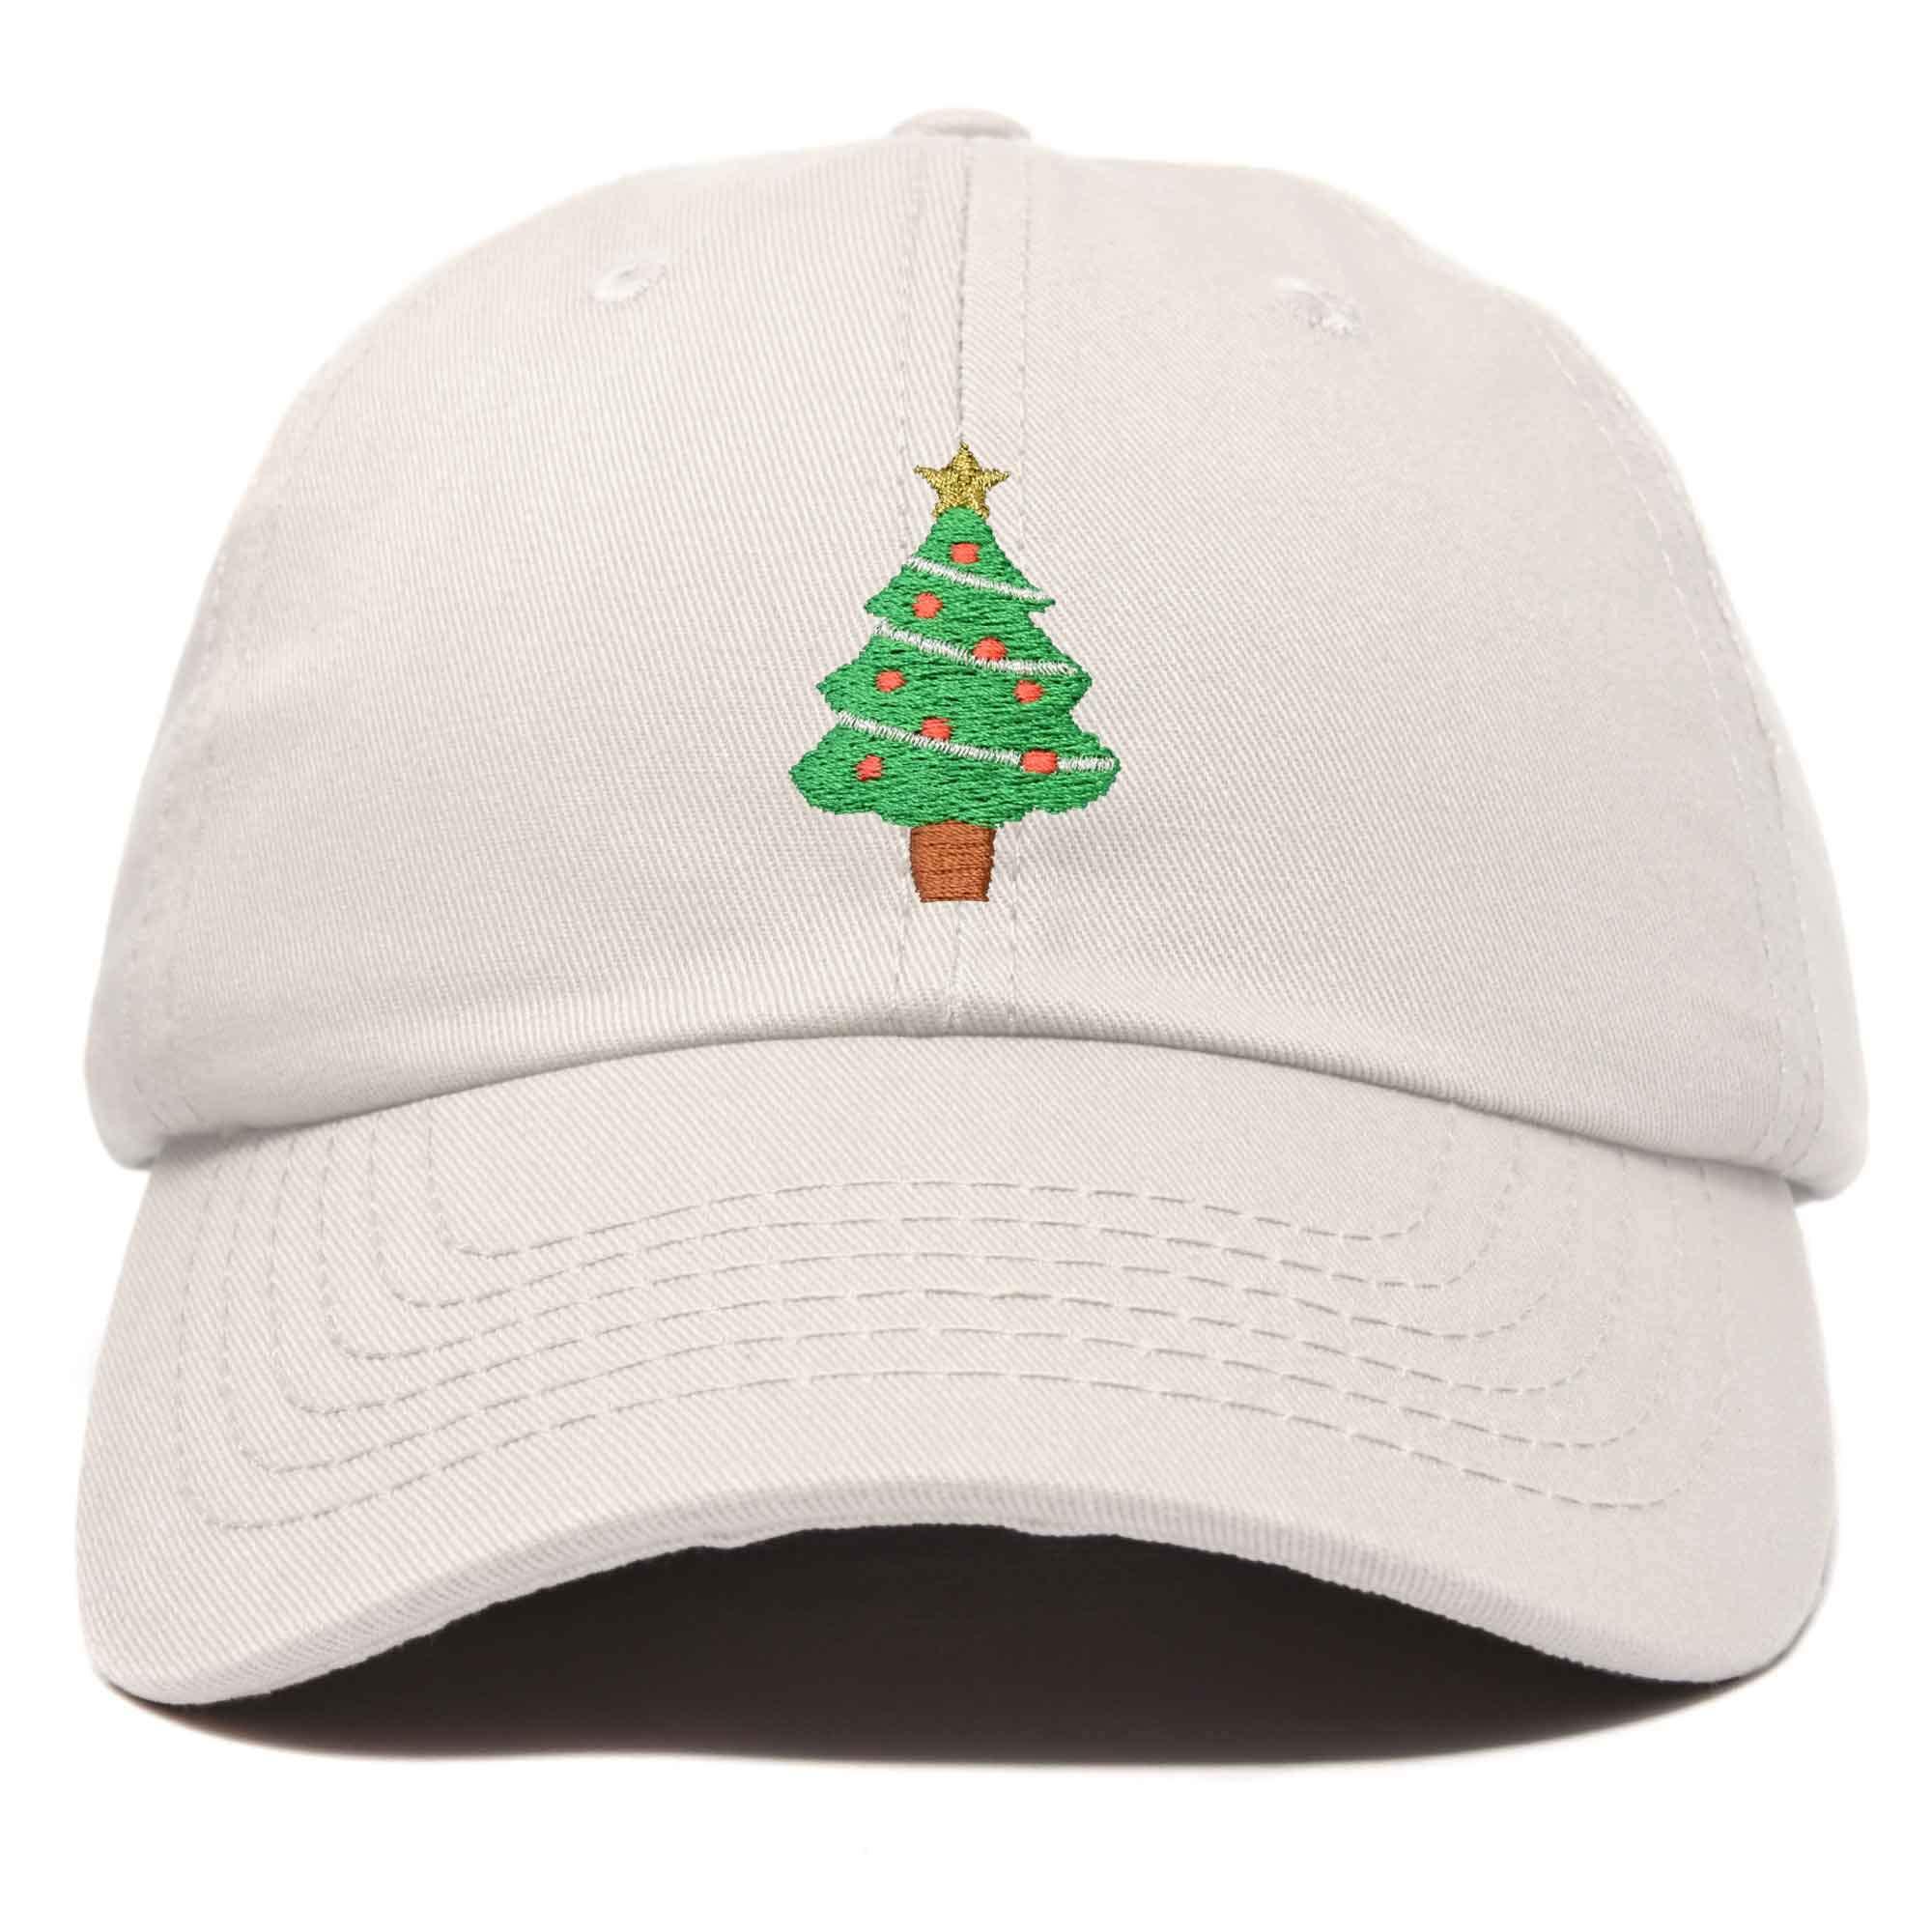 Xmas Holidays Christmas Tree Ball Cap Embroidered Hat